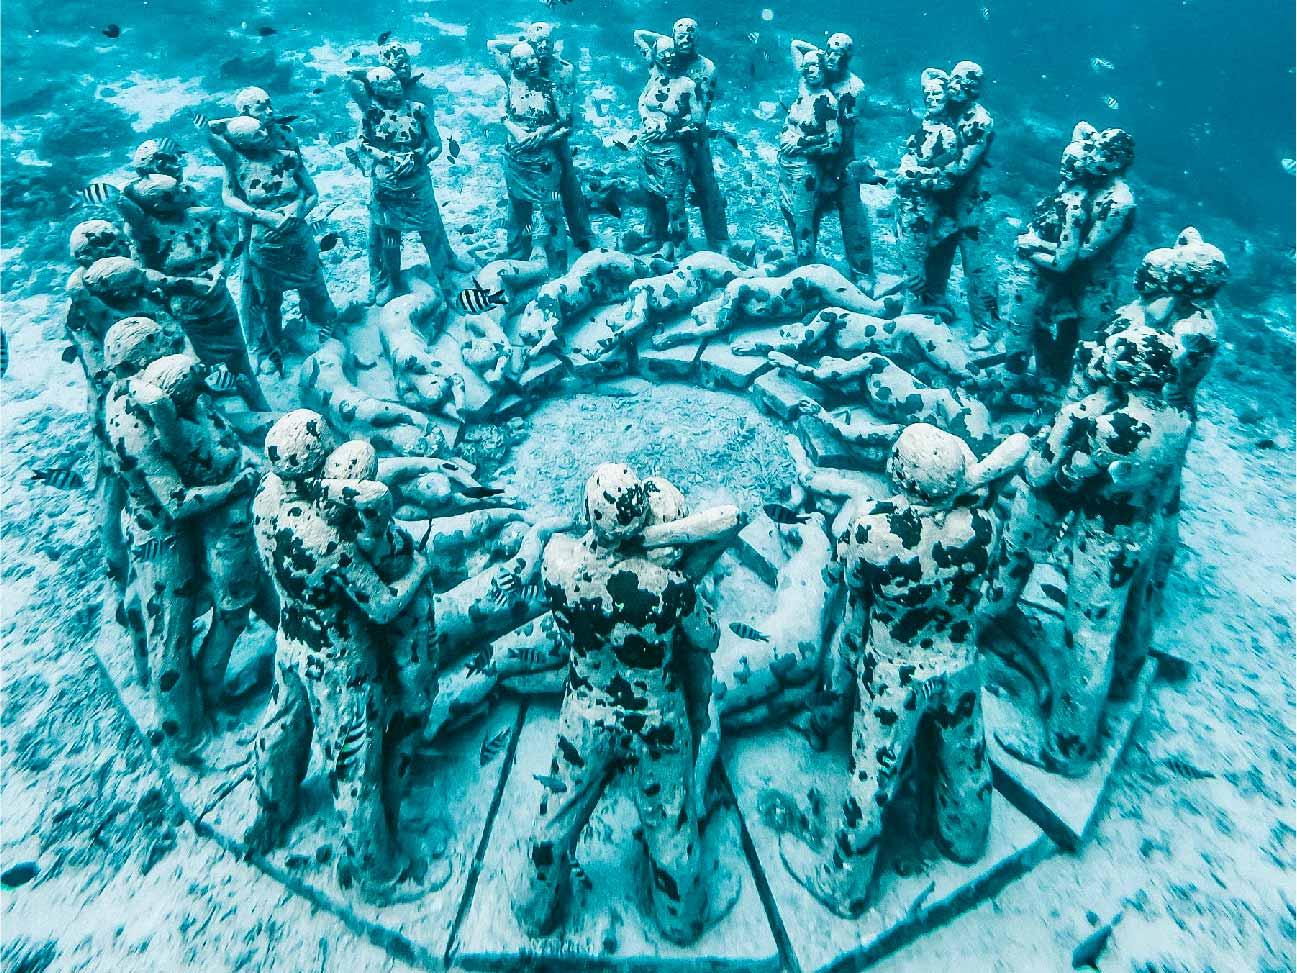 Bali Packing List GoPro Underwater Photo